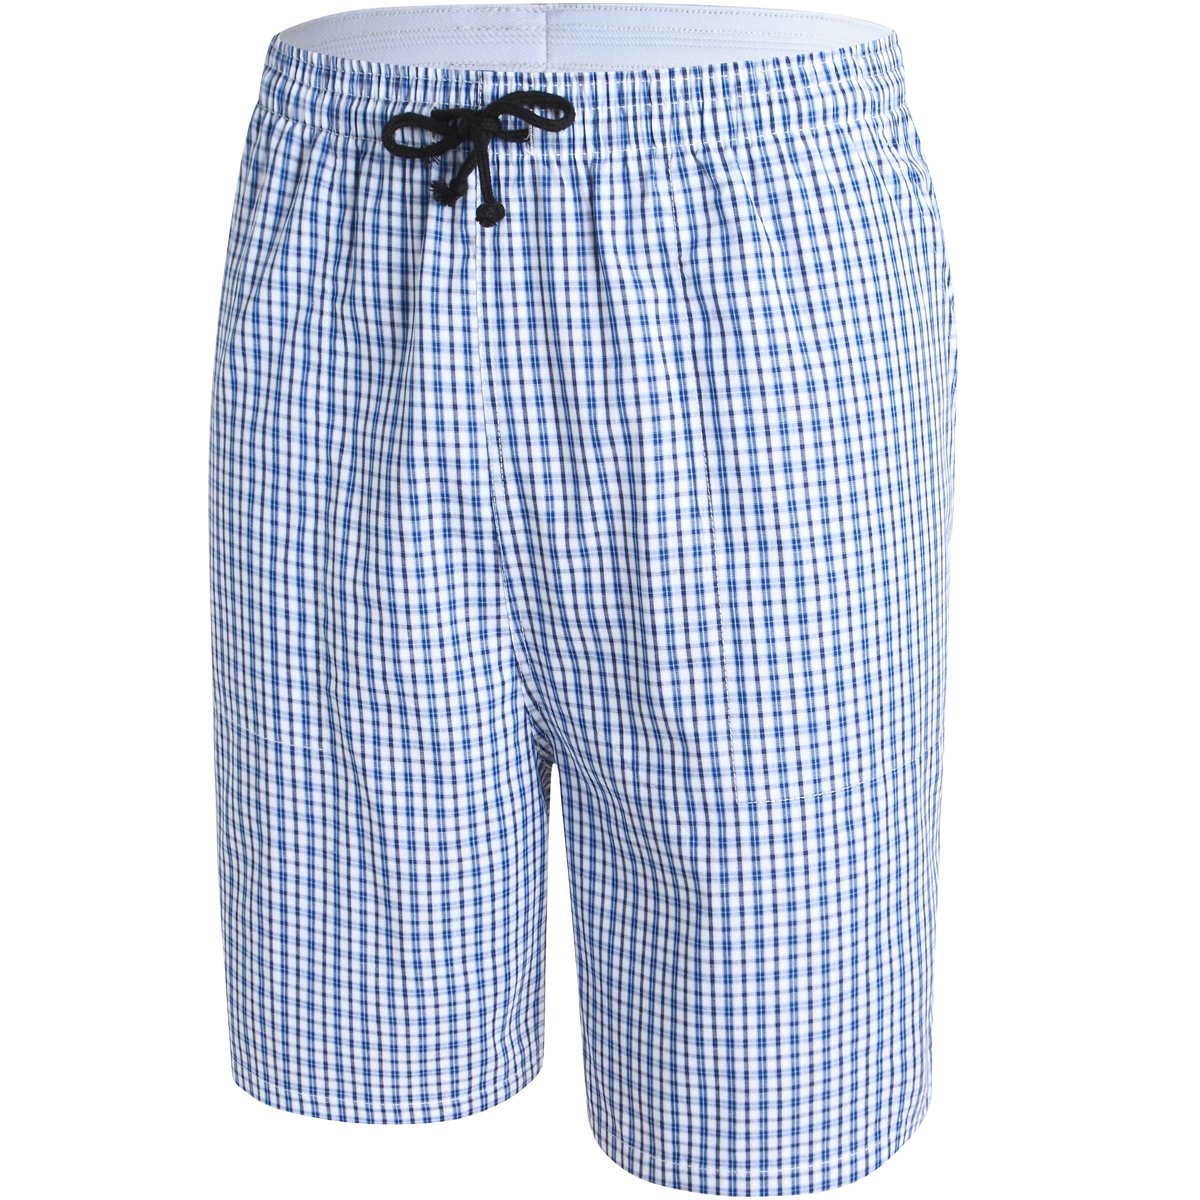 JINSHI Mens Lounge/Sleep Shorts Plaid Poplin Woven 3Pack Cotton by JINSHI (Image #2)